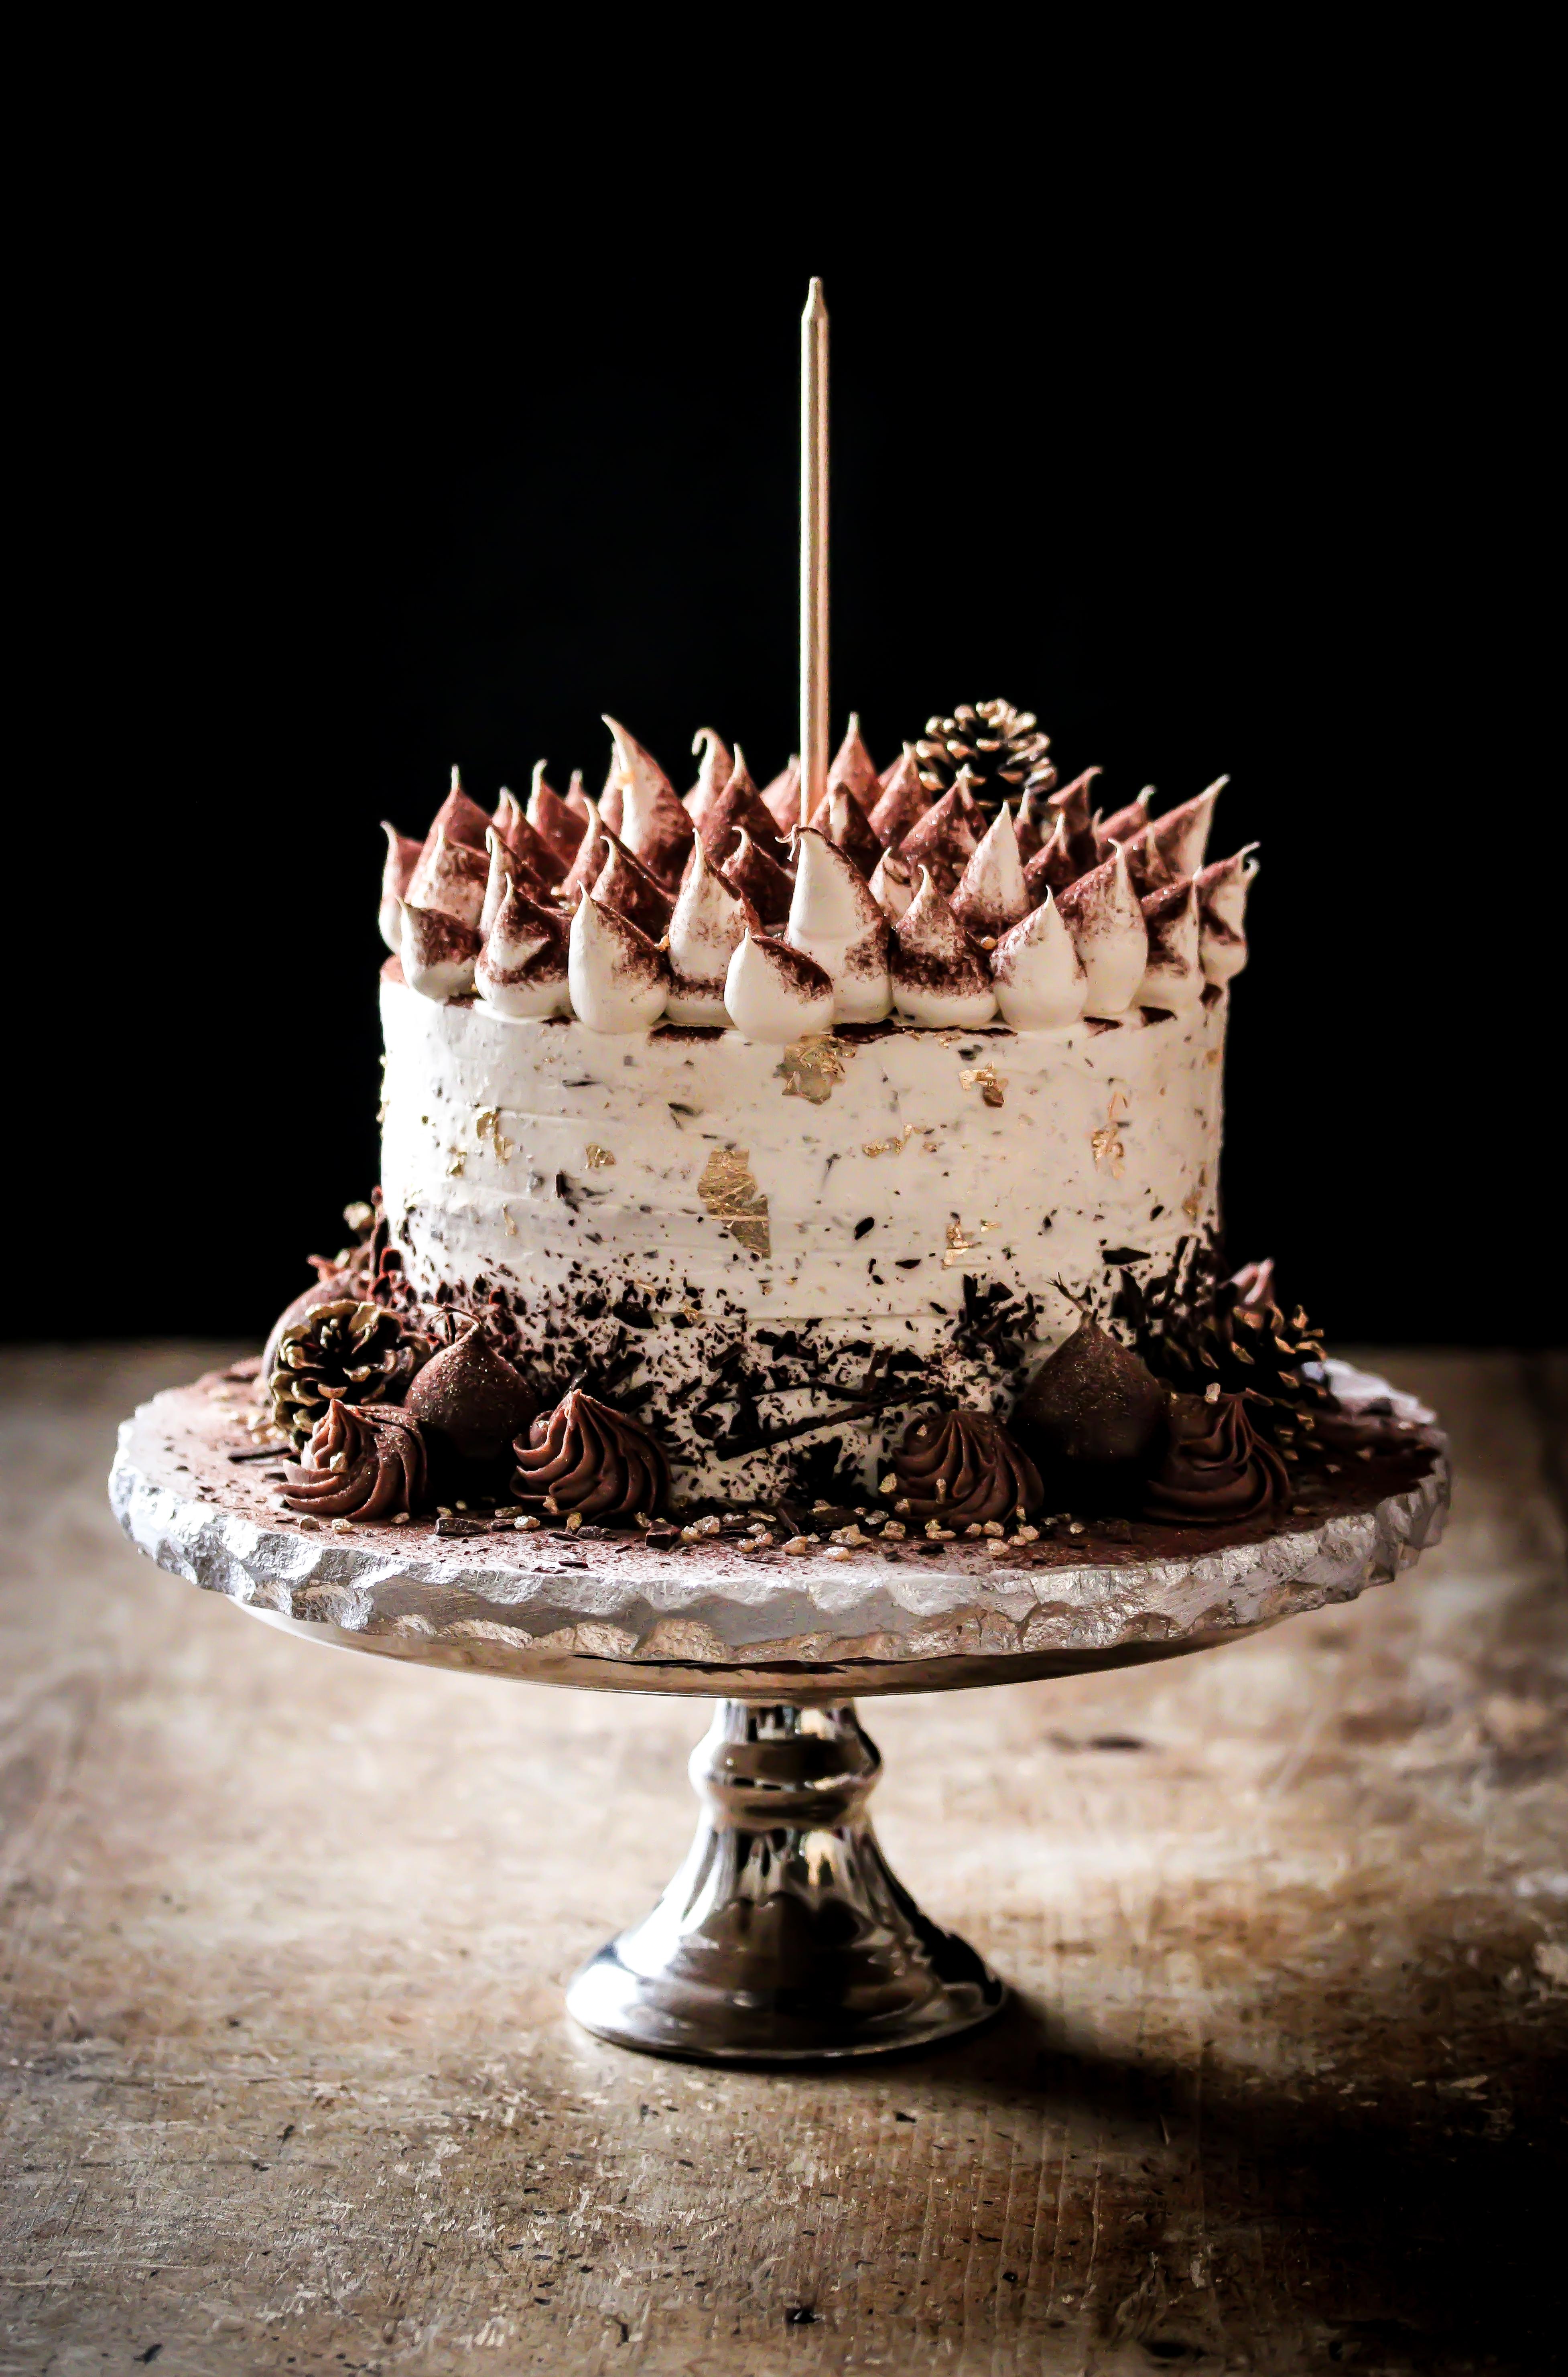 Chestnut_Tiramisù_Cake_Candle_Tortology